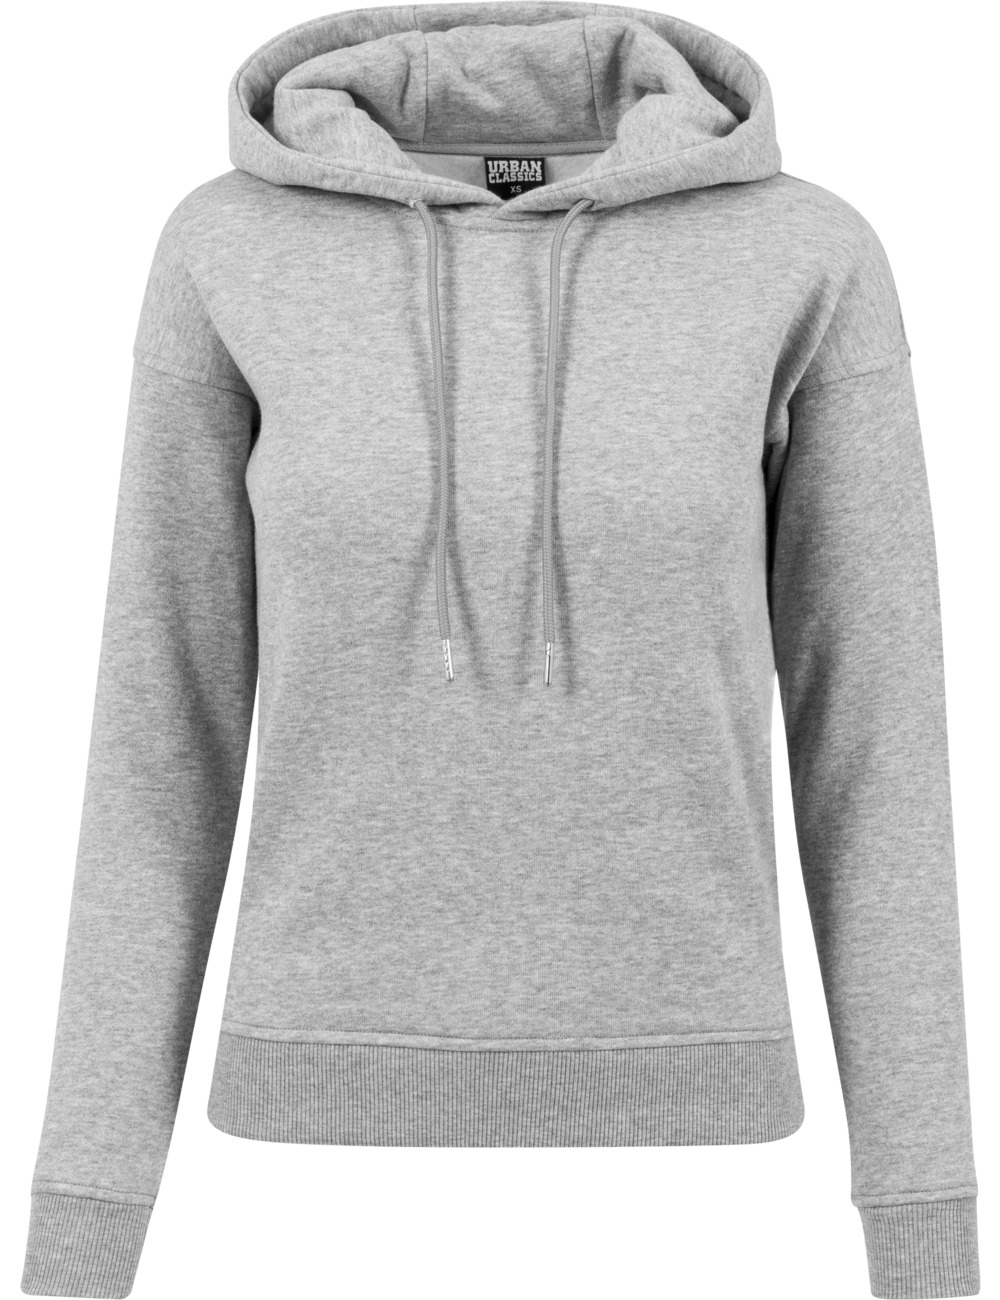 Urban Classics Damen Sweater Hoody L, Grey (20111)